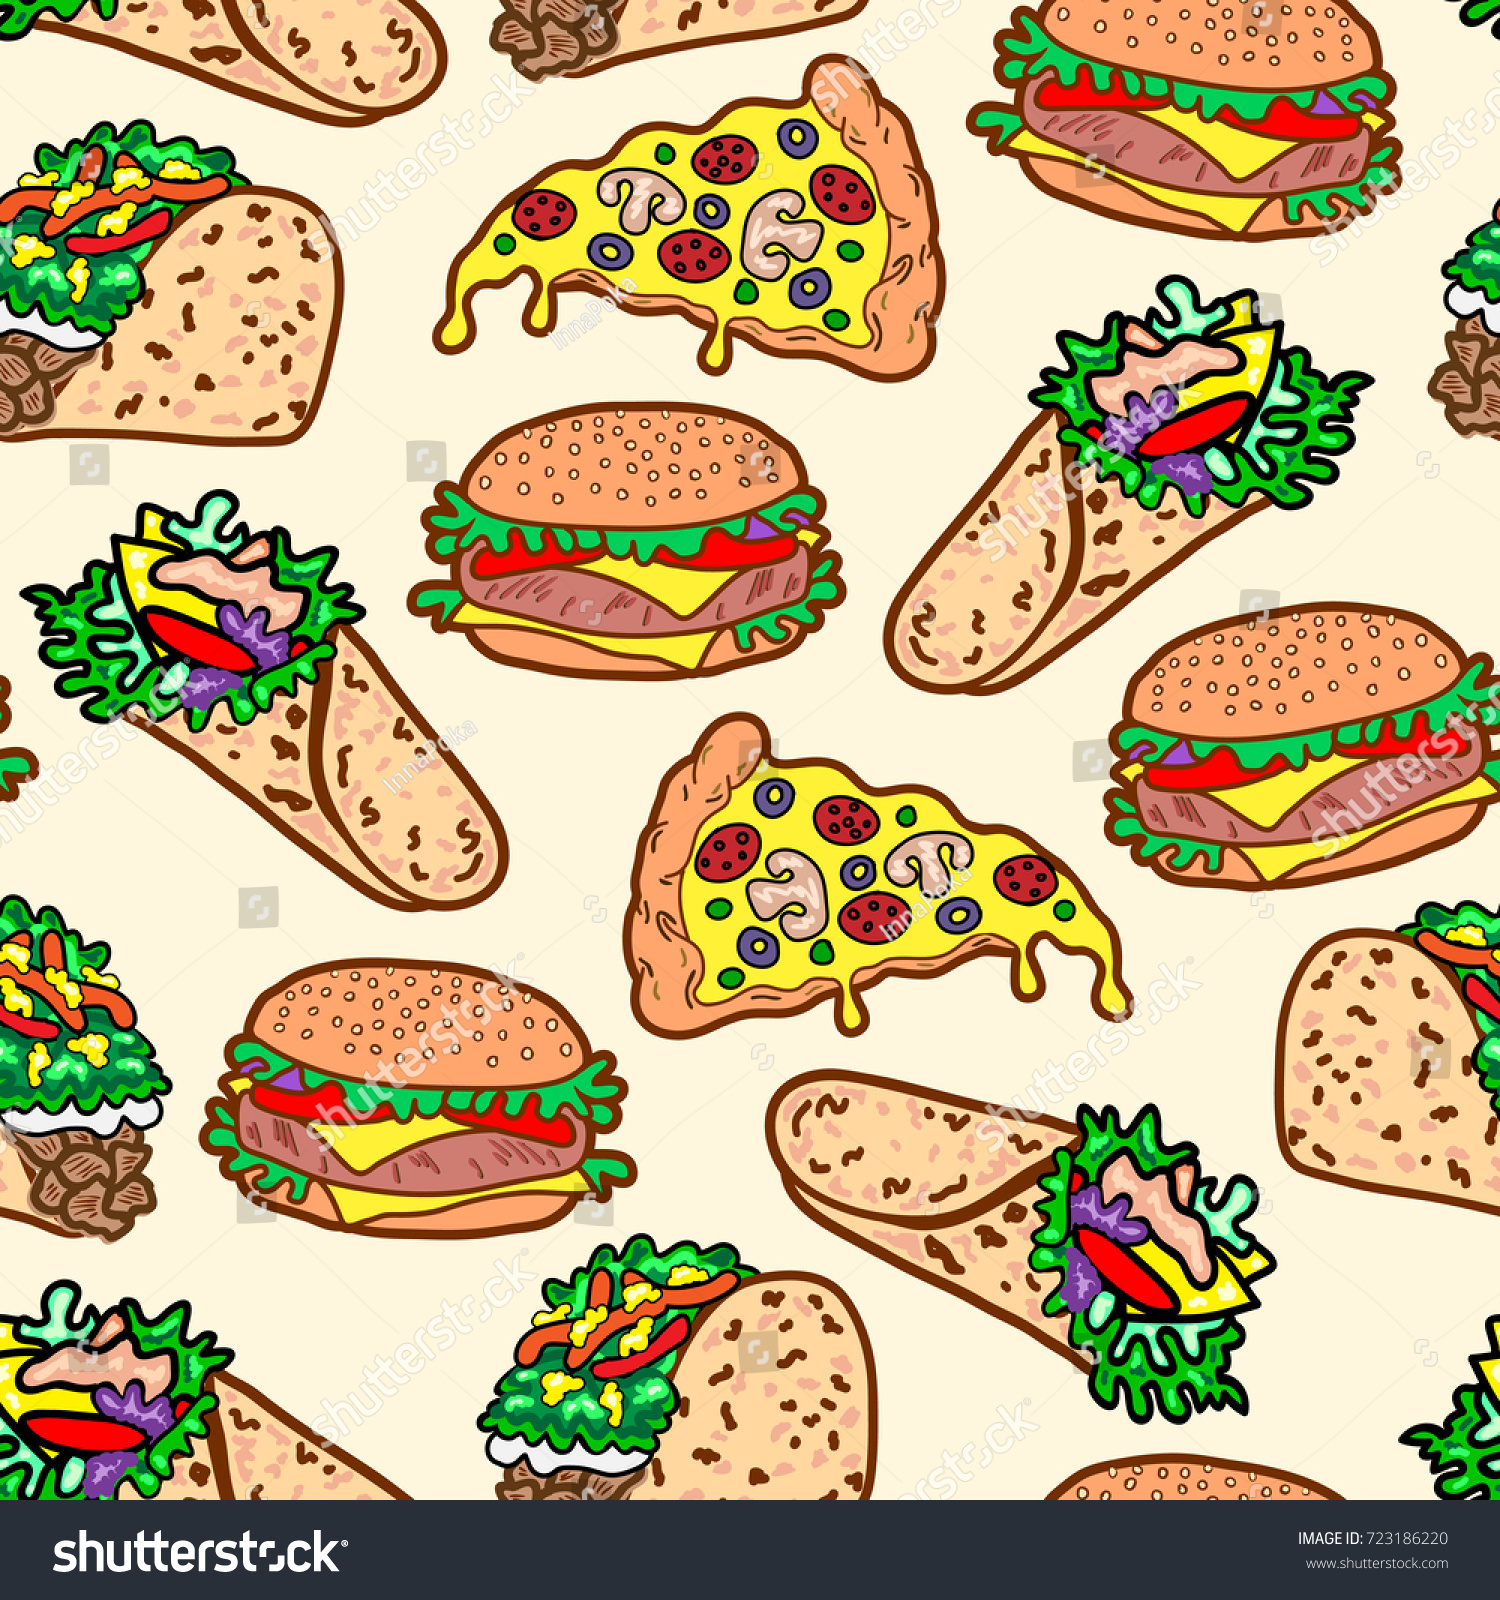 Medical abbreviations taco - Vector Sandwiches Seamless Pattern Cheeseburger Hamburger Wrap Roll Taco Toast